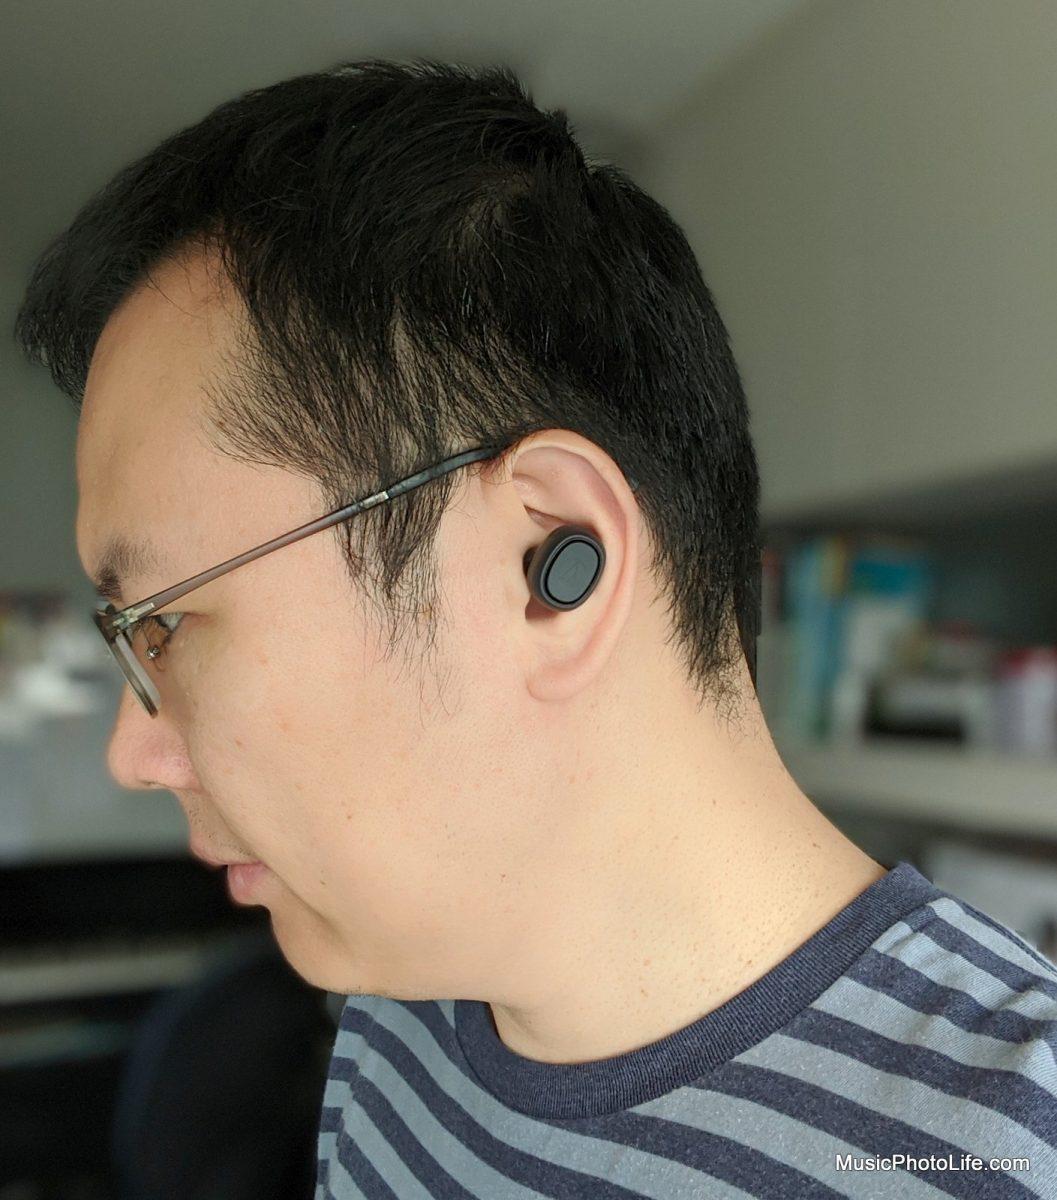 Audio-Technica ATH-CK3TW wearing in ears